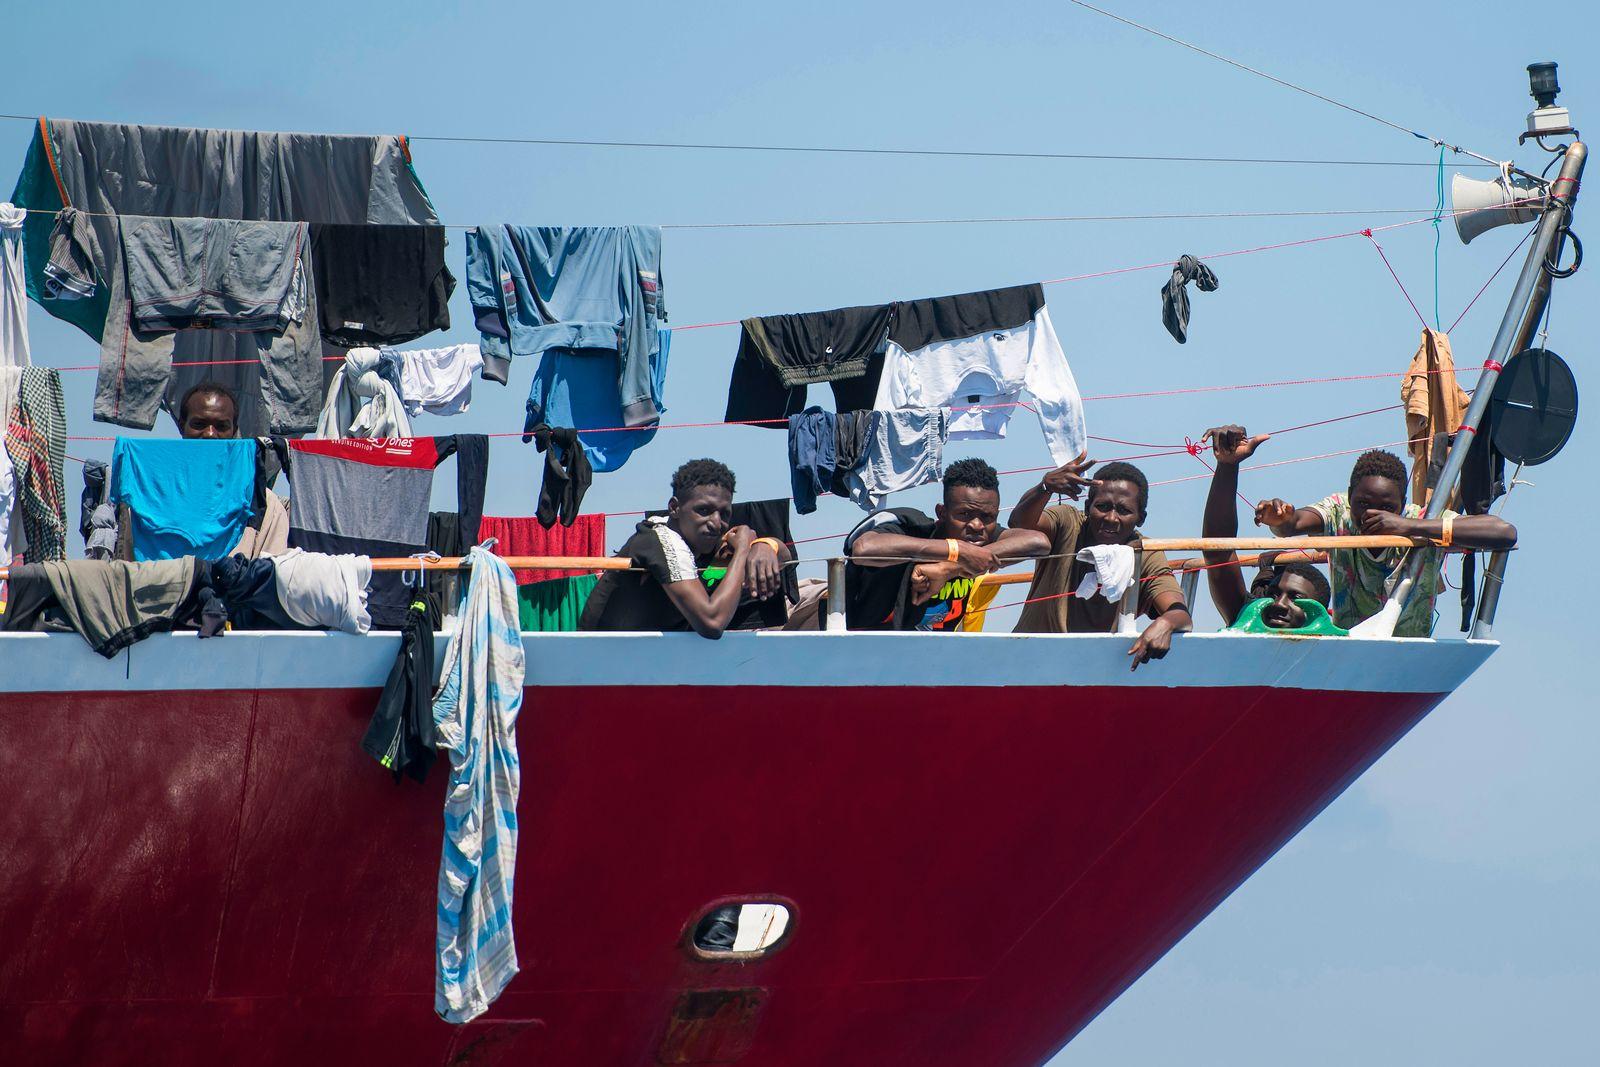 APTOPIX Malta Migrants Stranded At Sea